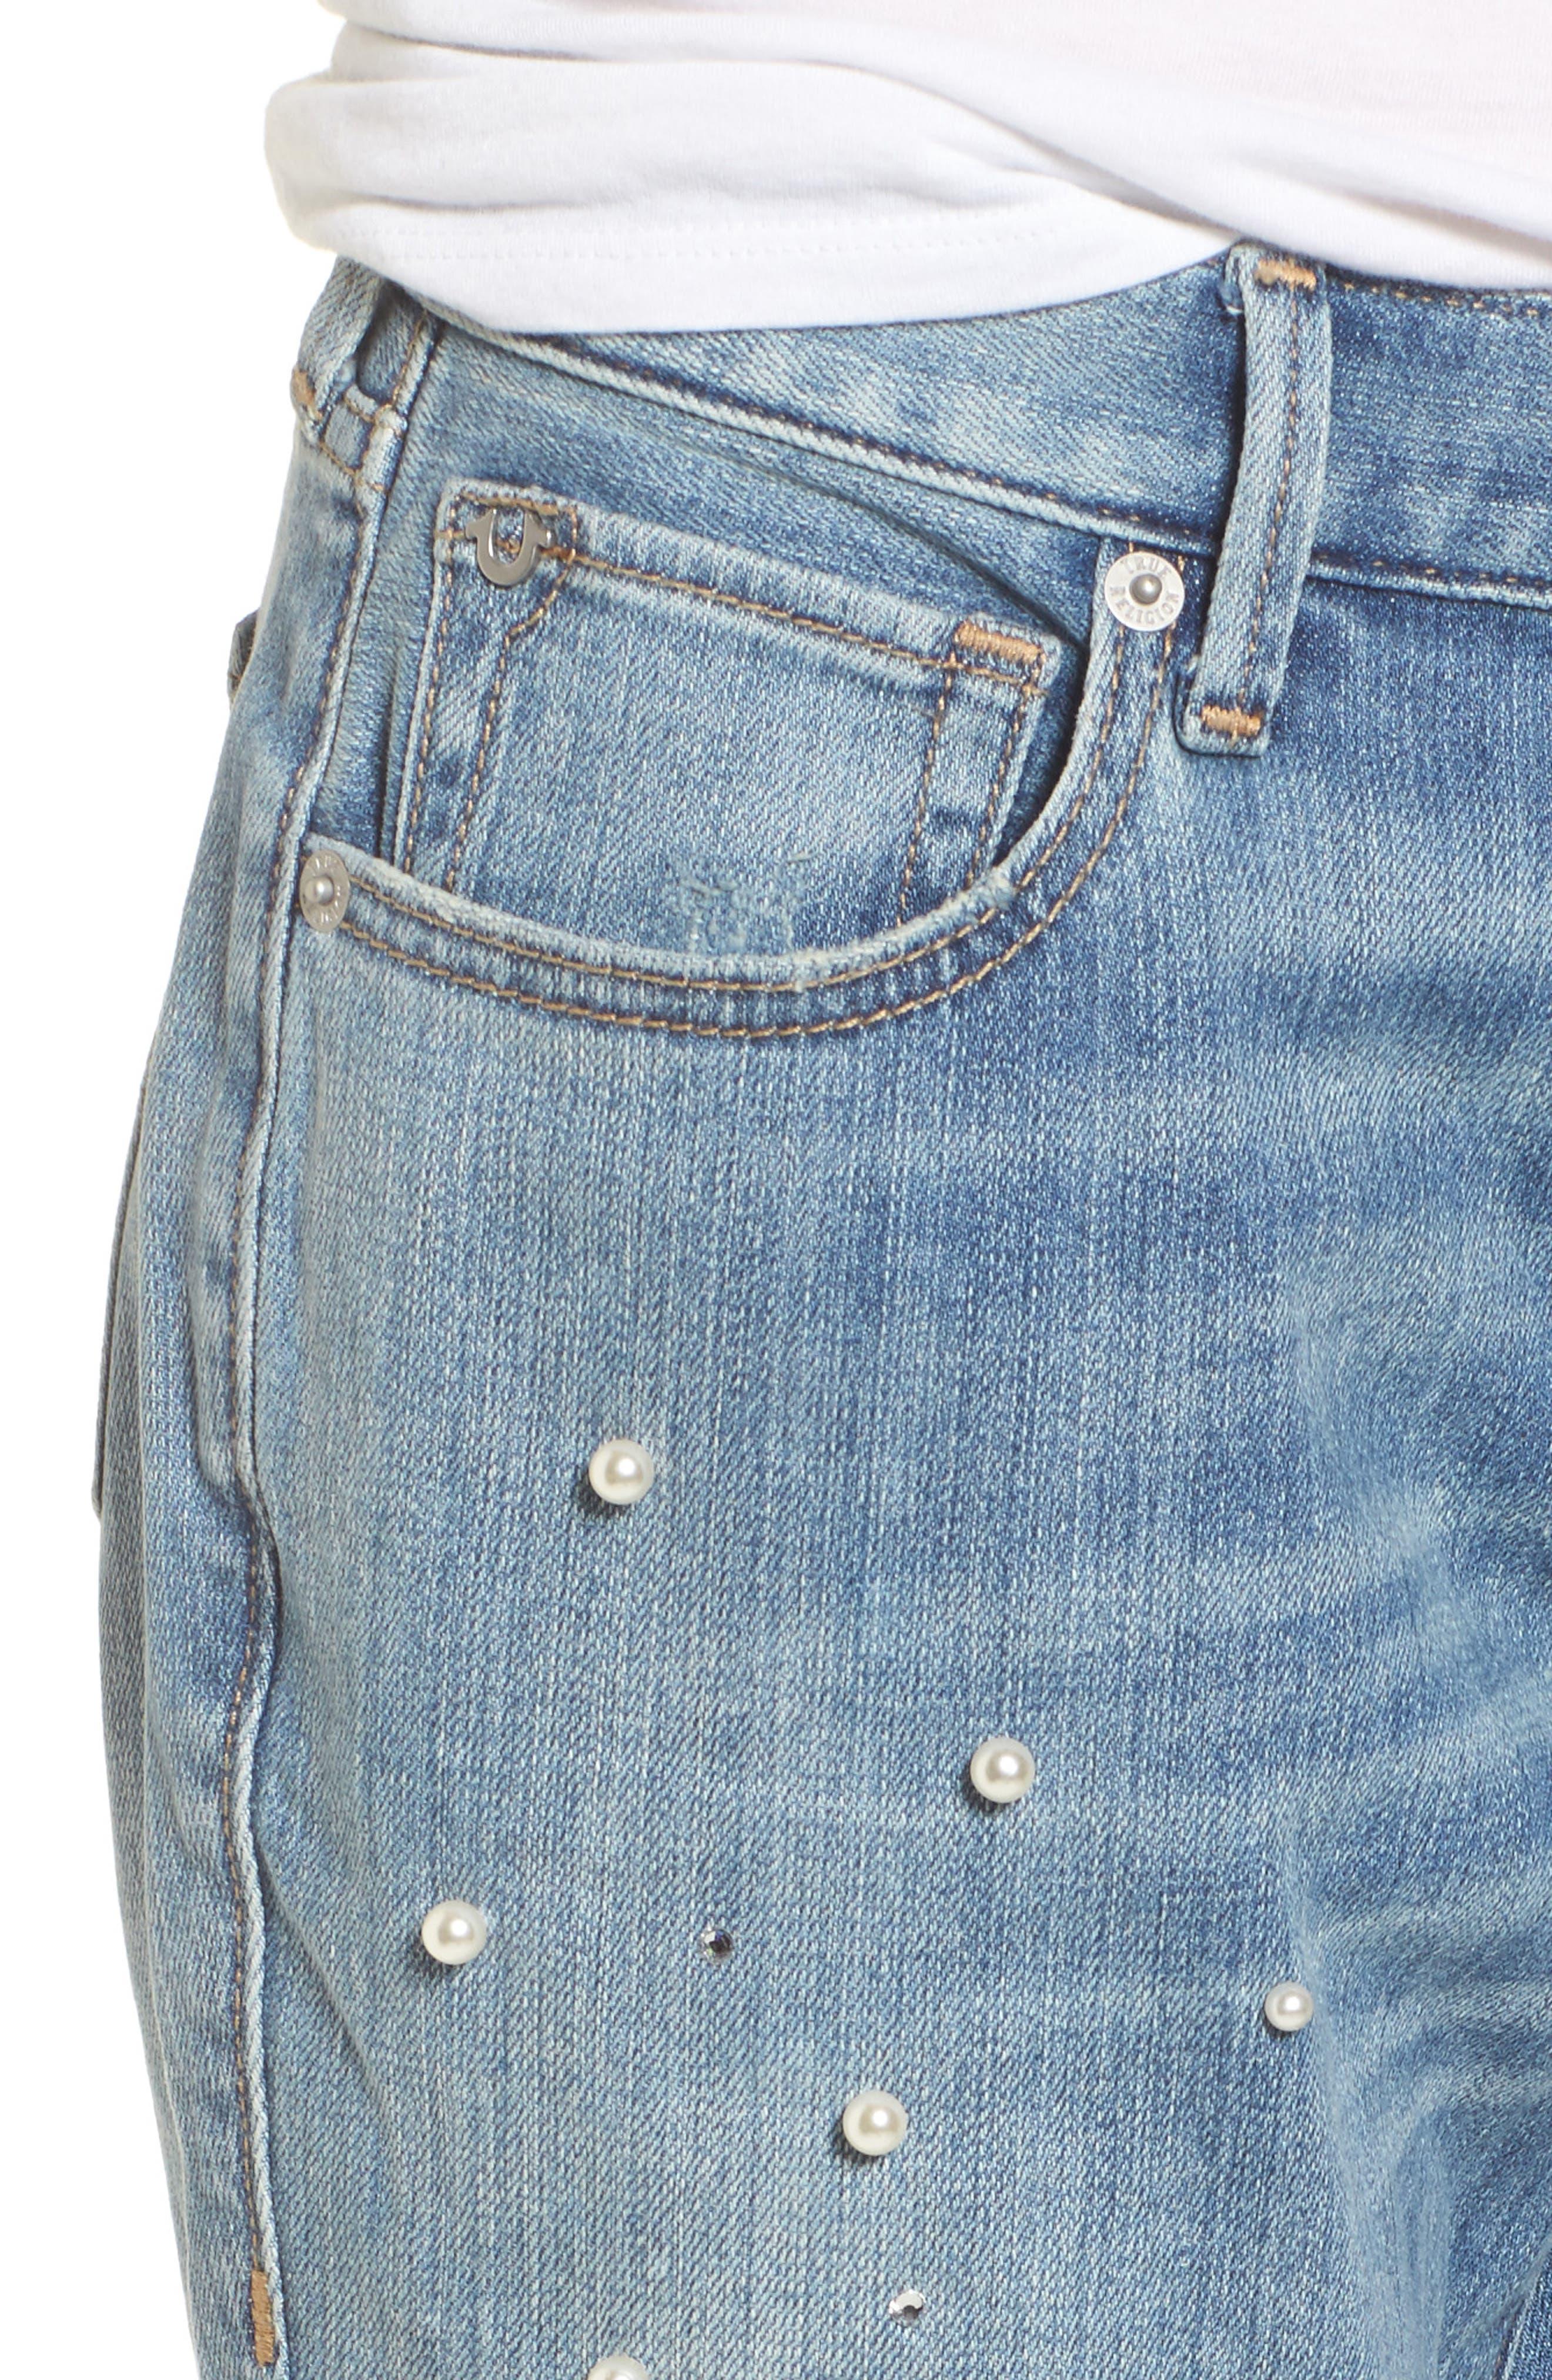 Cameron Slim Boyfriend Jeans,                             Alternate thumbnail 4, color,                             Slip Away